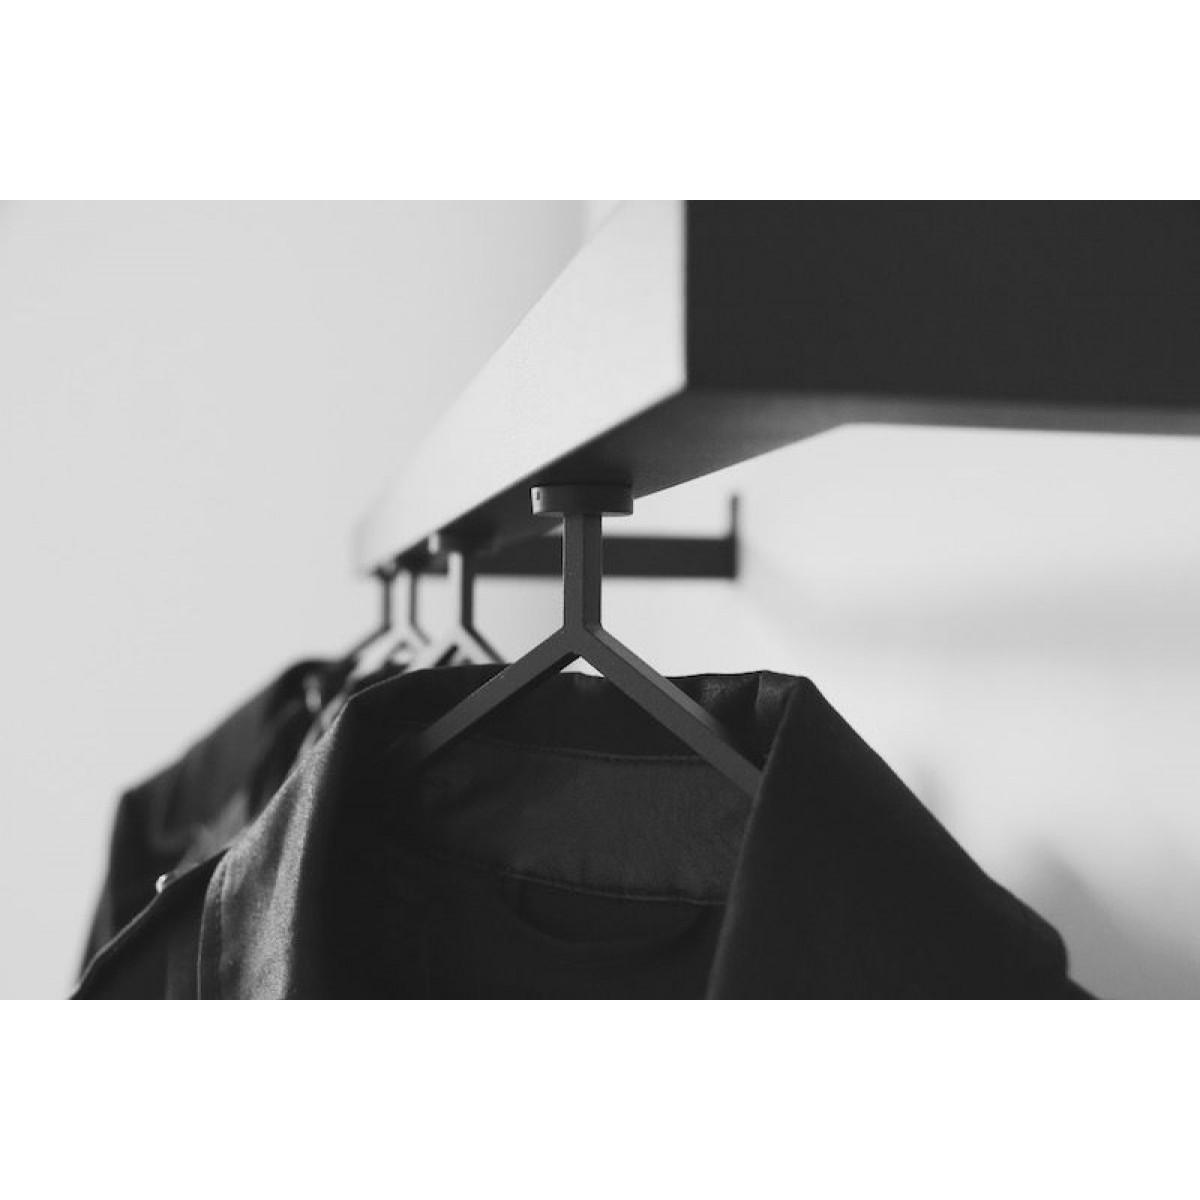 HangSys -Small